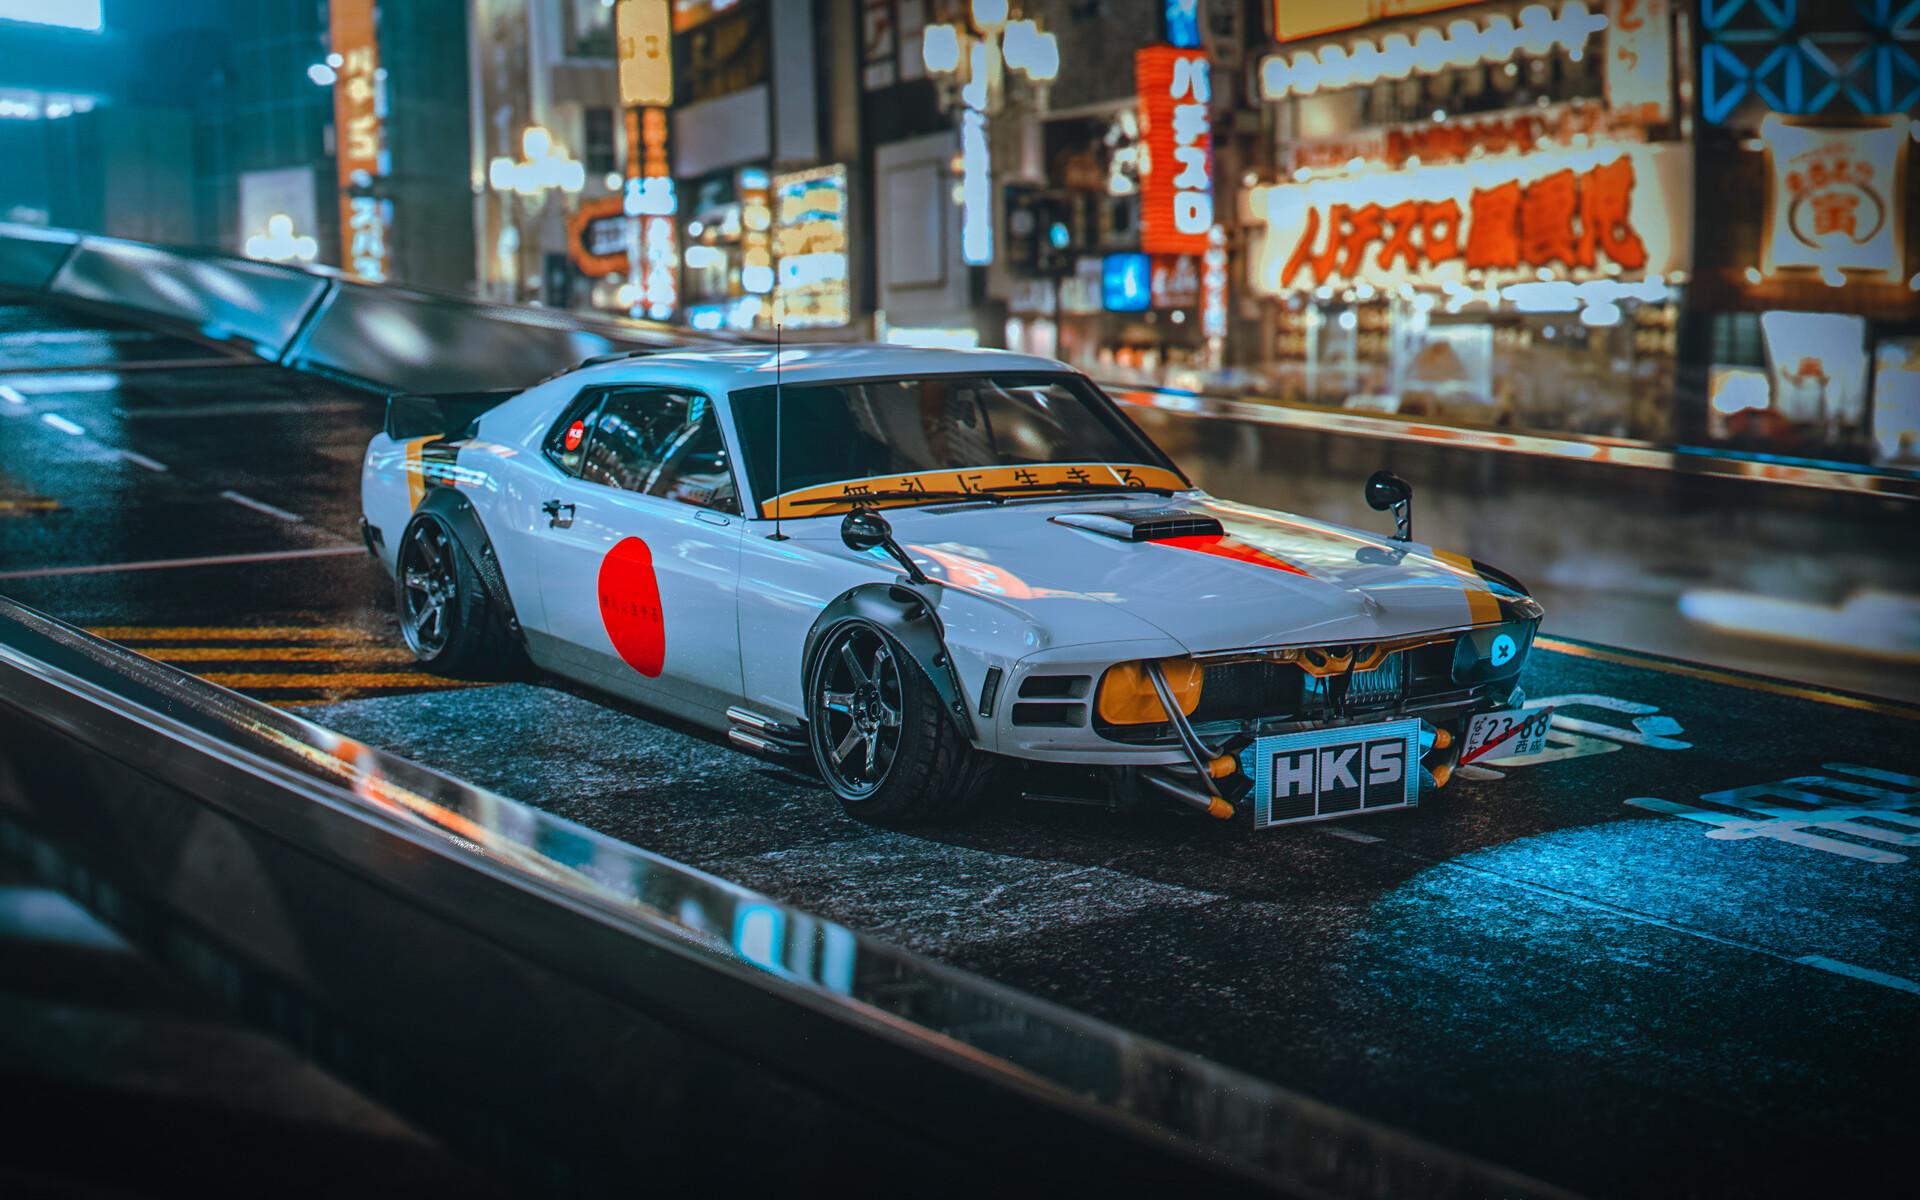 General 1920x1200 traditional 3d car Japan concept art flag vehicle